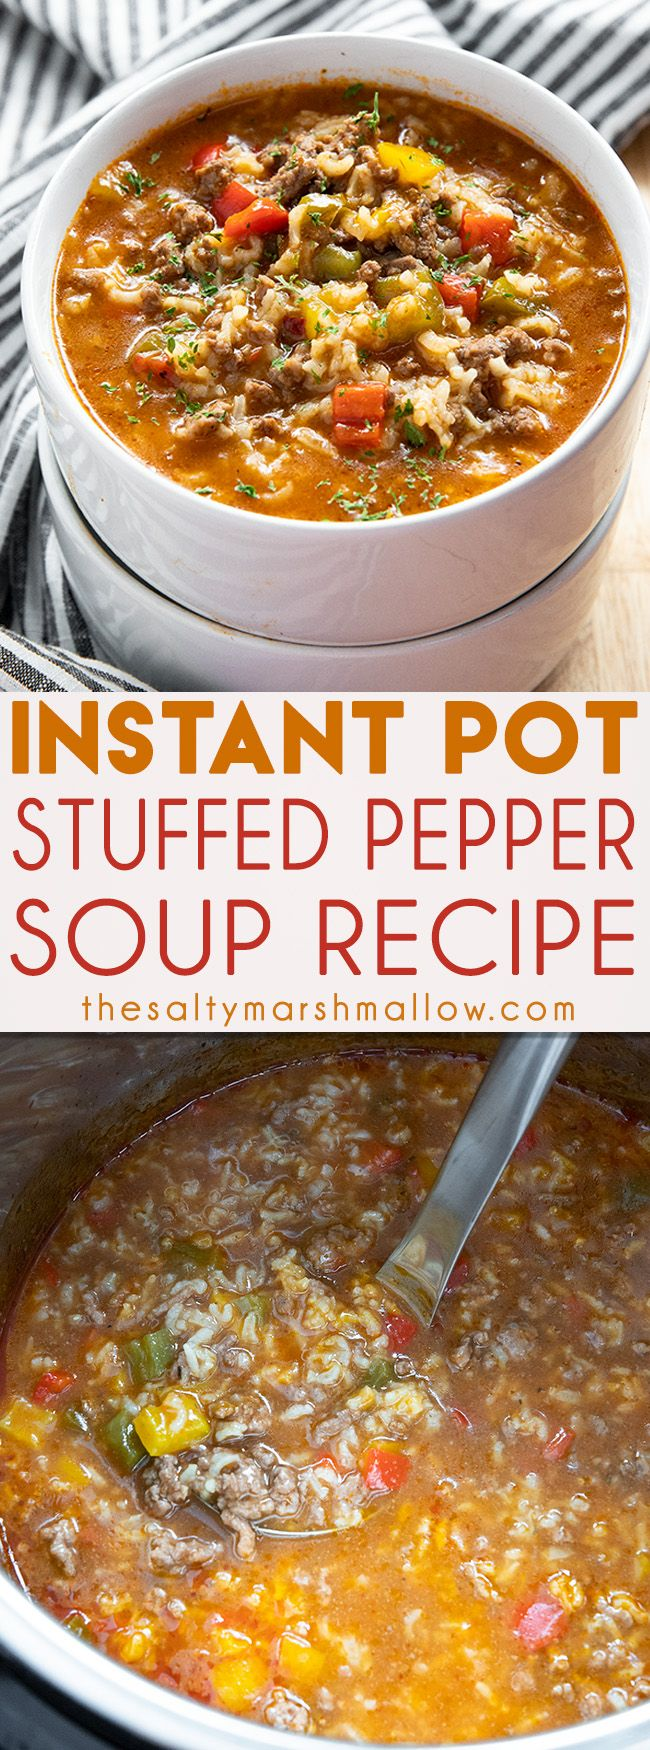 Instant Pot Stuffed Pepper Soup The Salty Marshmallow Recipe Instant Pot Soup Recipes Stuffed Peppers Instant Pot Recipes